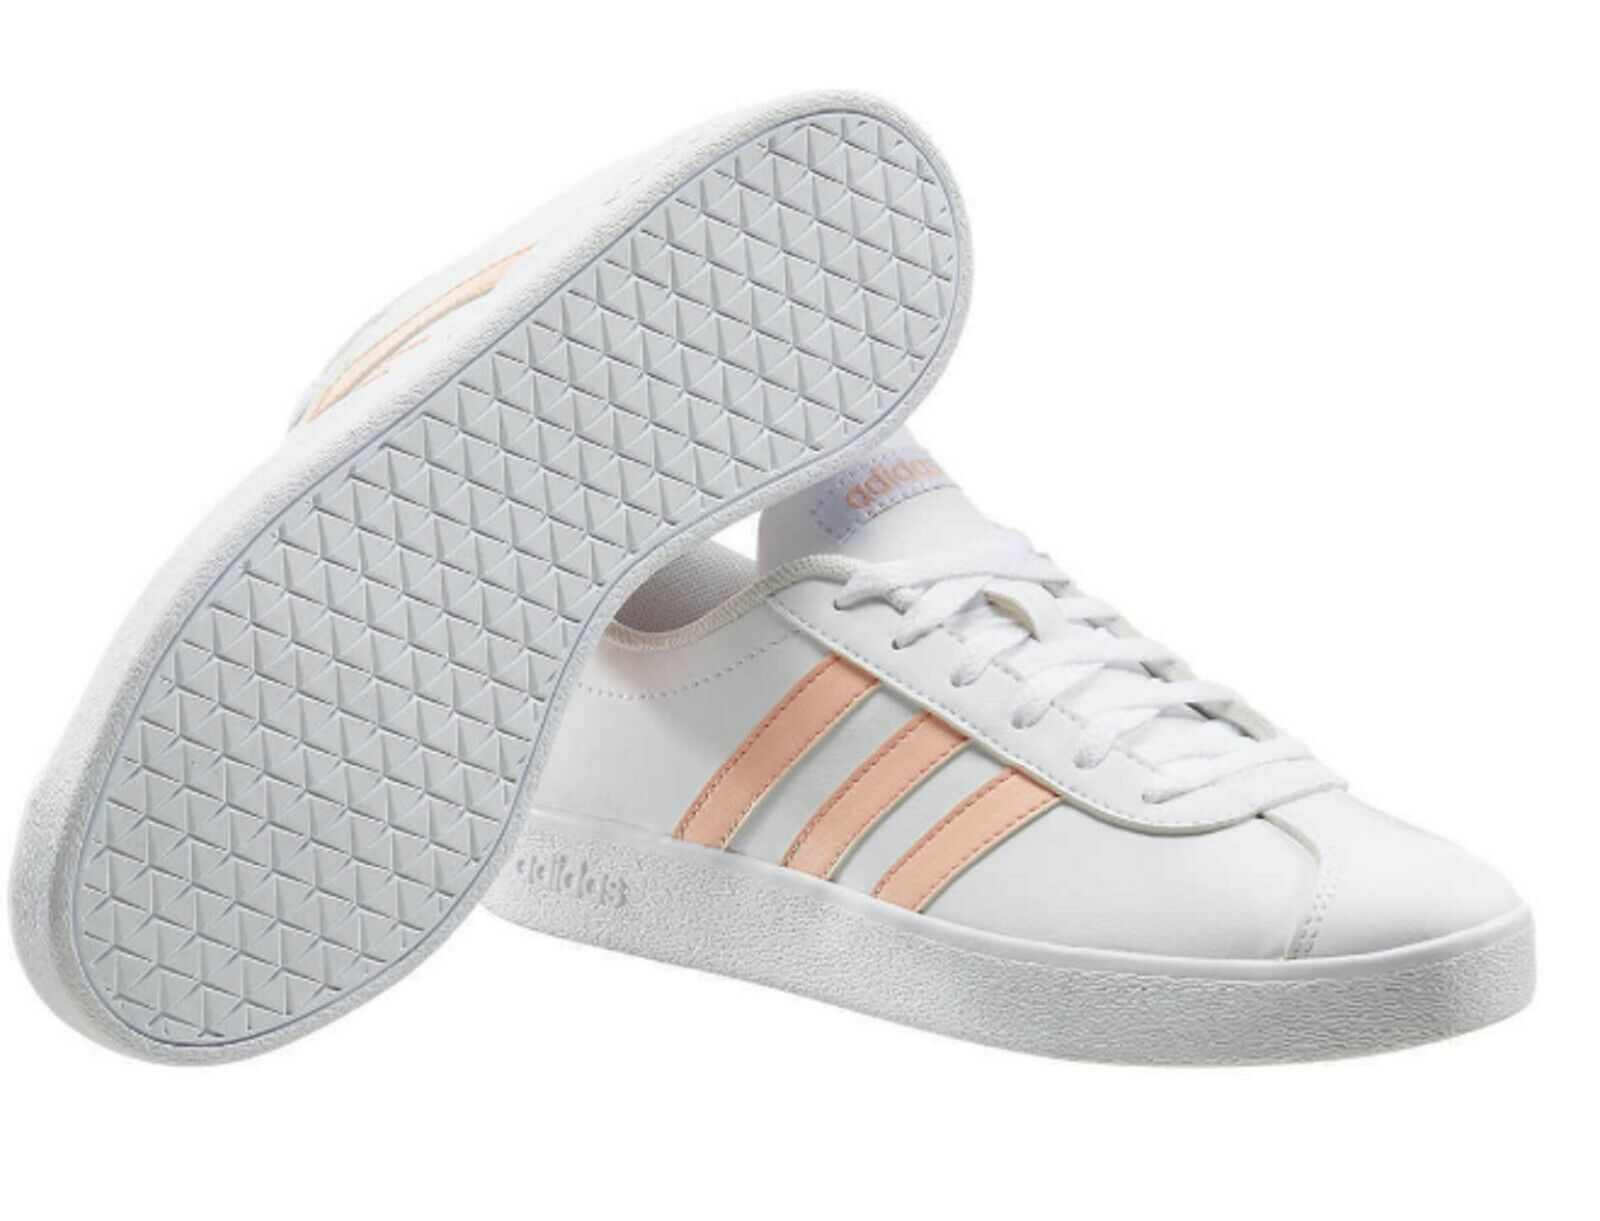 Adidas Kids Girls VL Court 2.0 Running Sneakers in White/Pink Size 12K